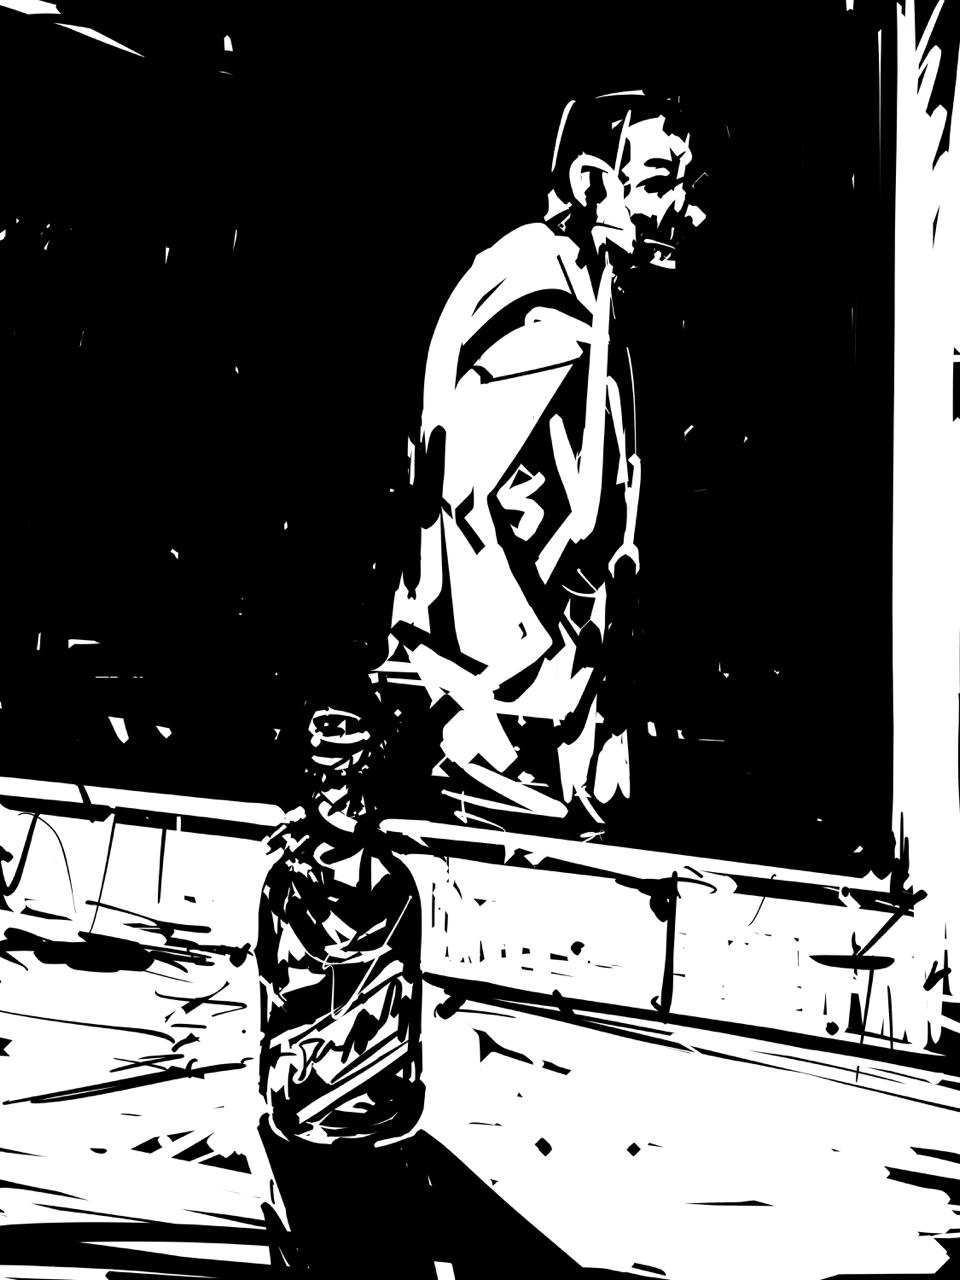 The beer bottle